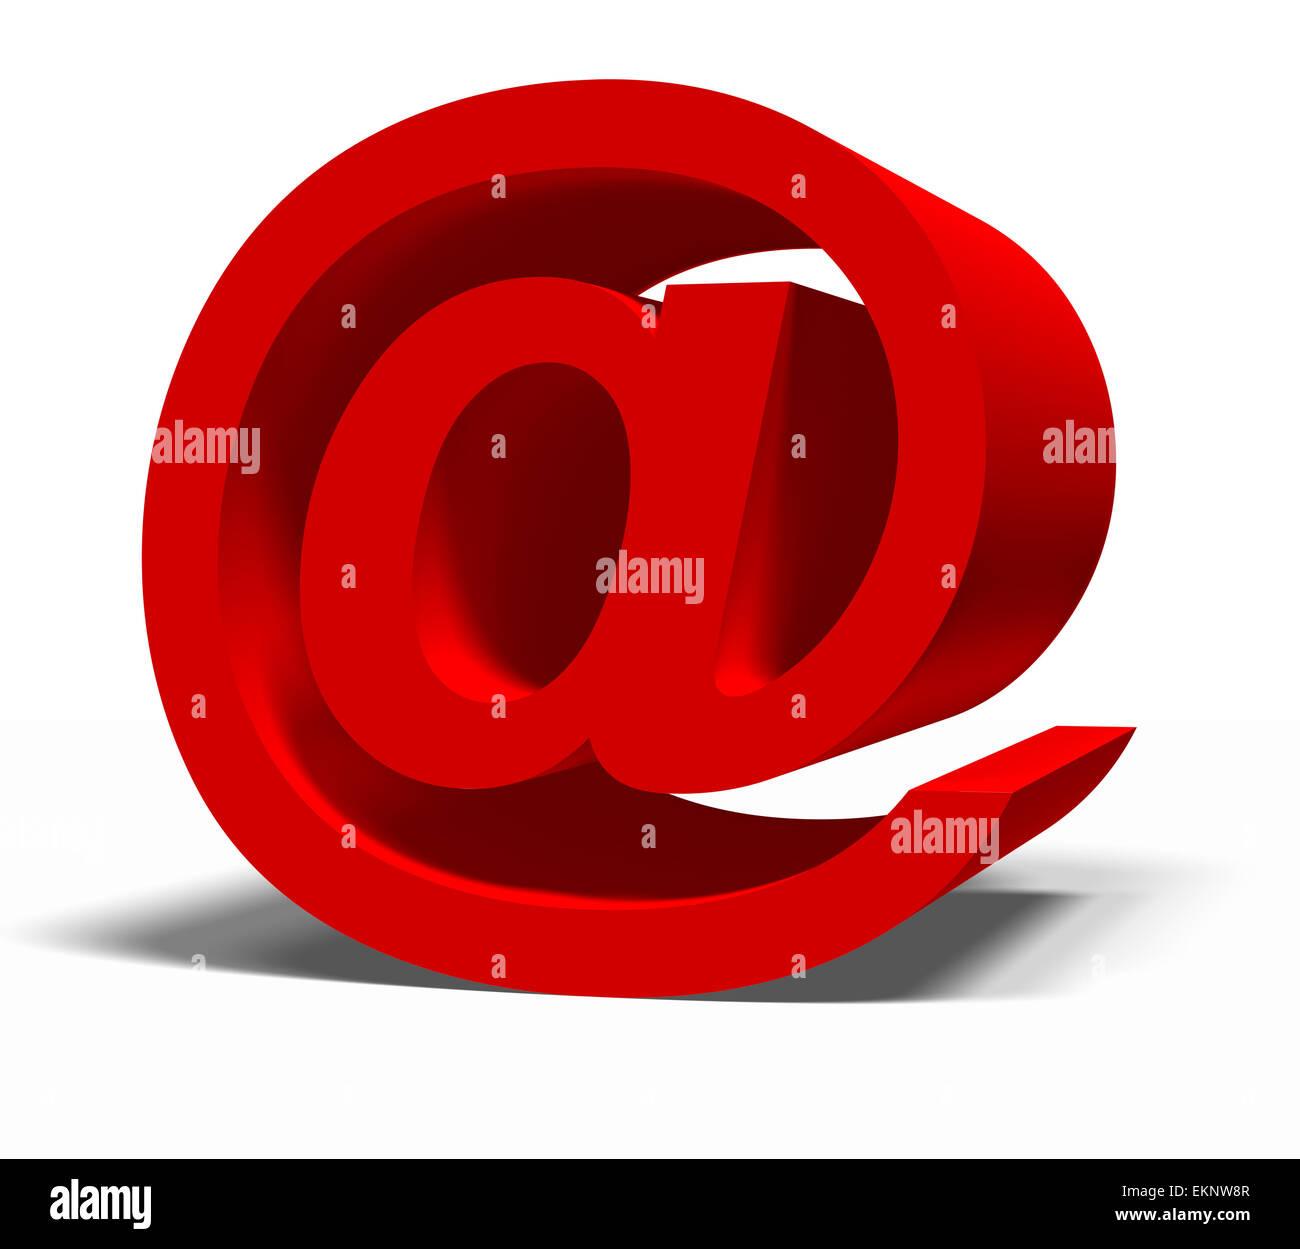 e-mail symbol - Stock Image